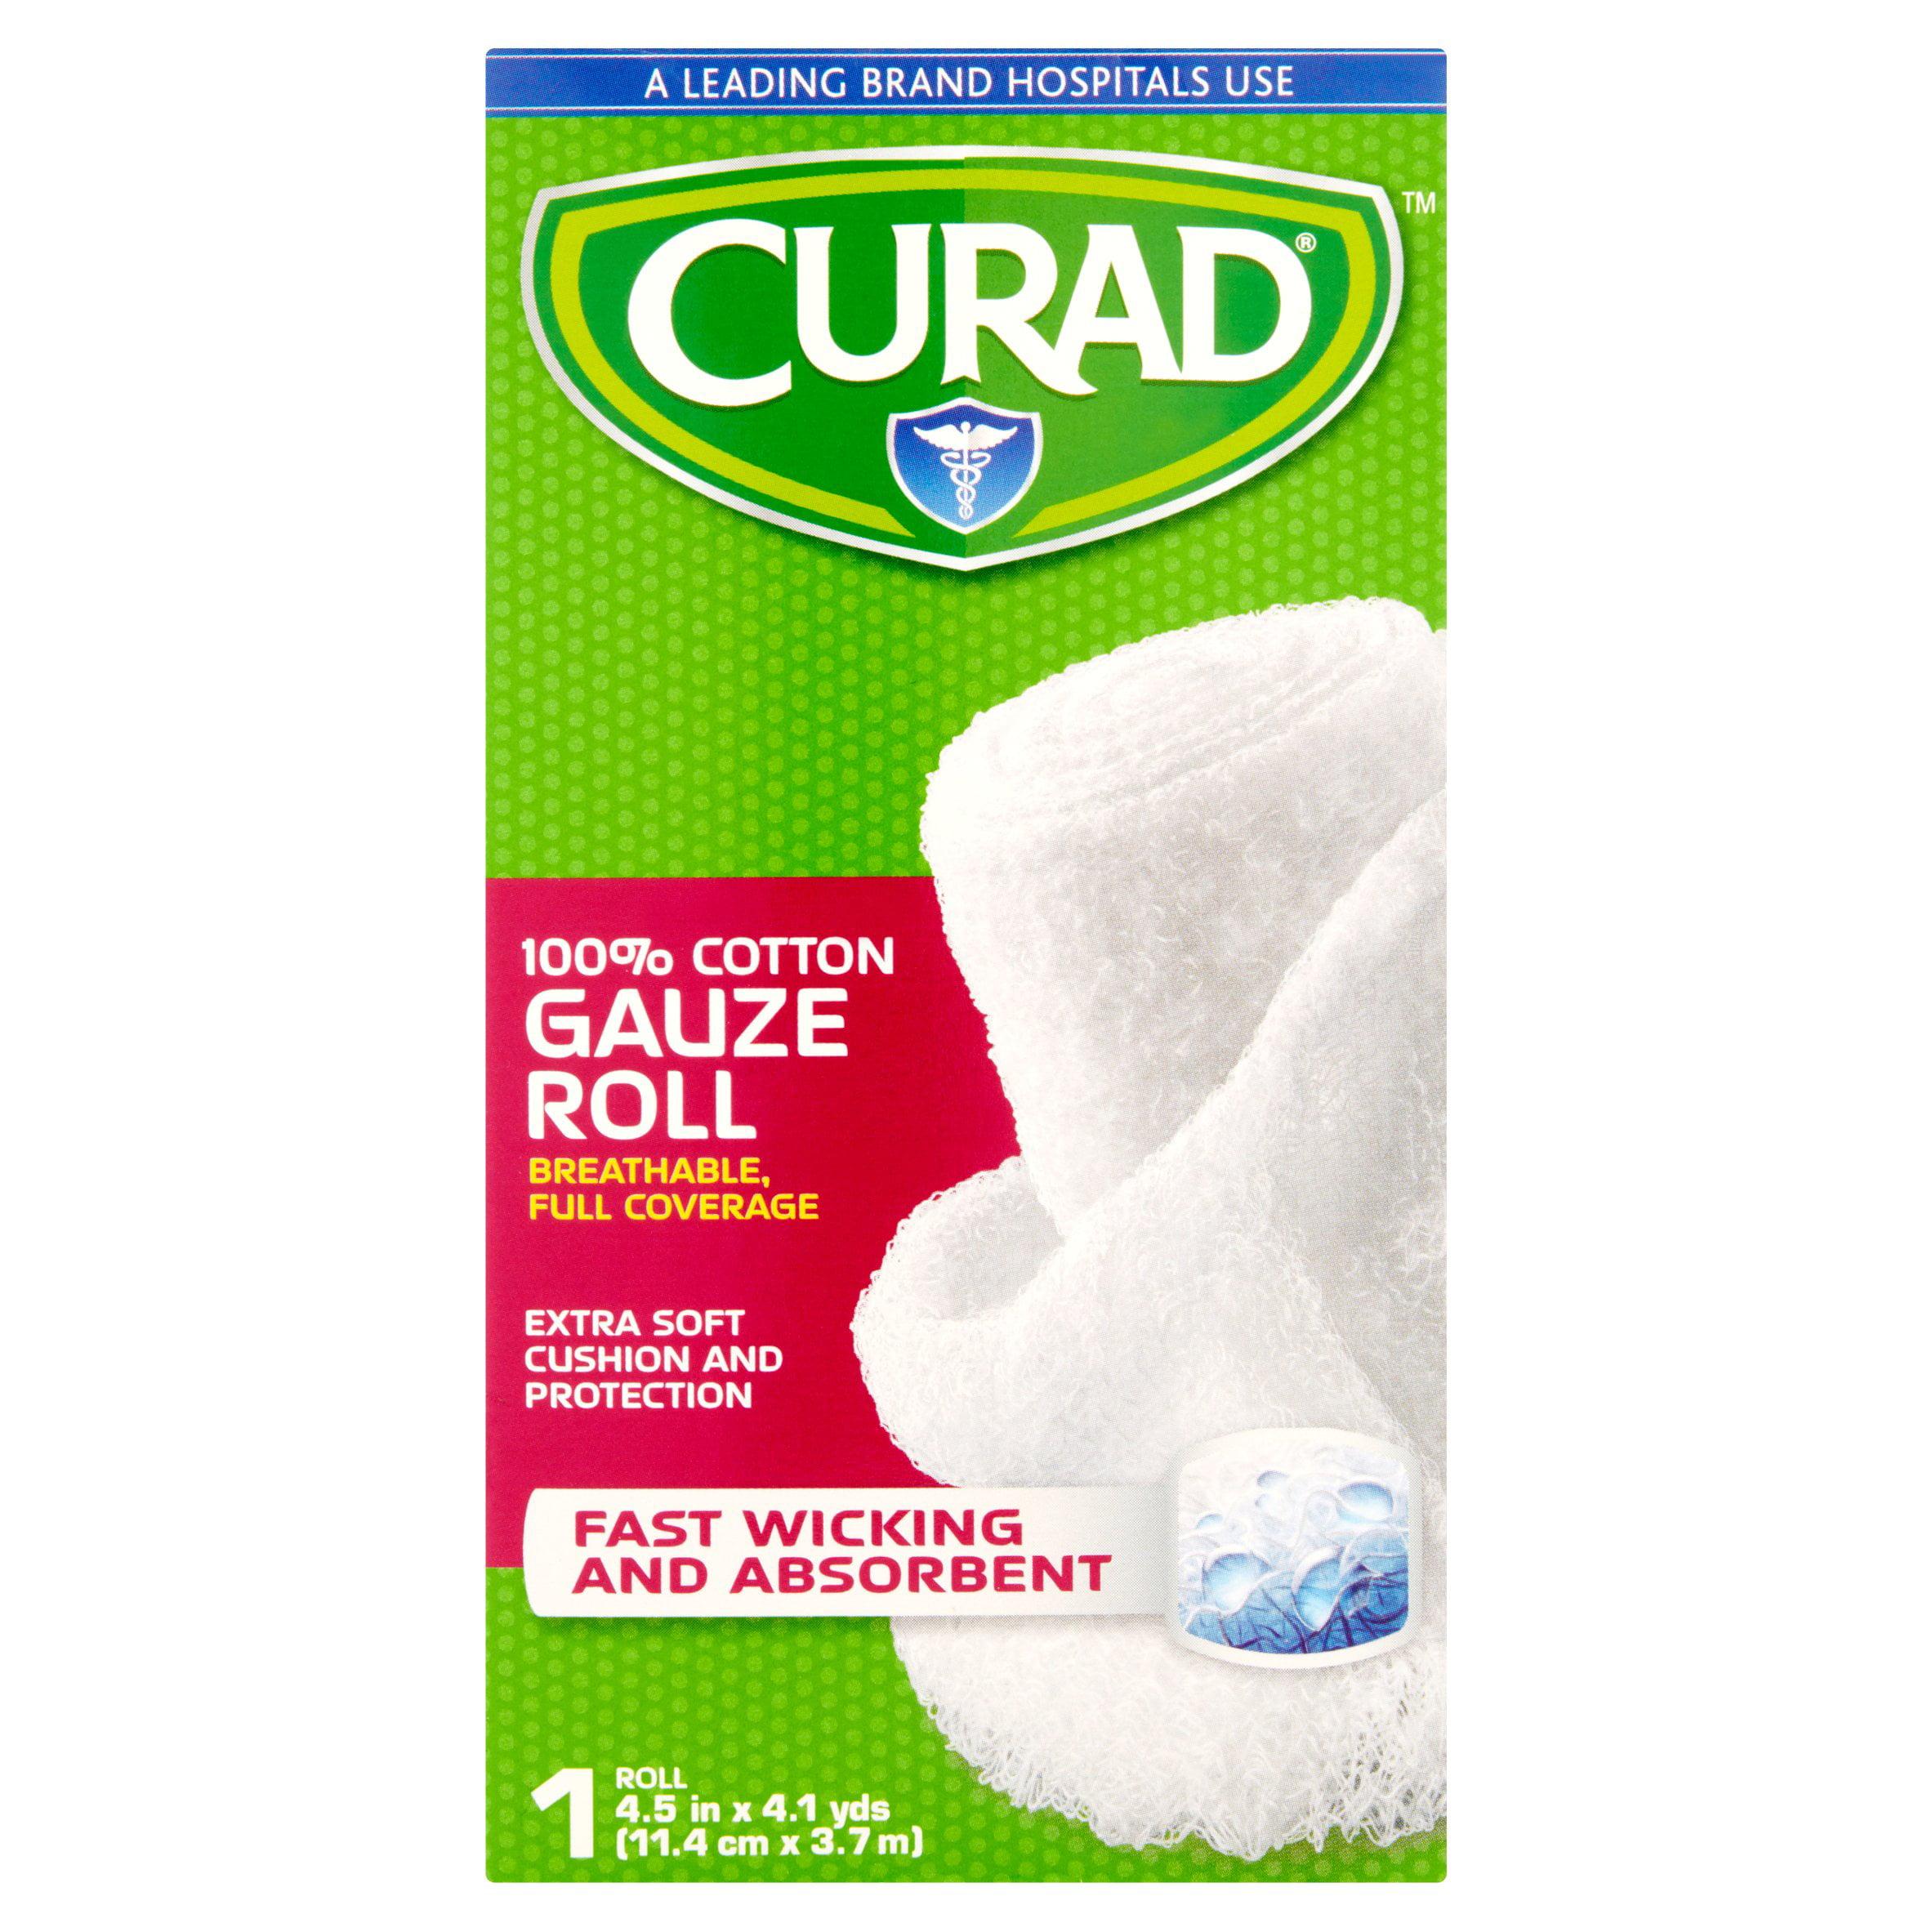 Curad 100% Cotton Gauze Roll